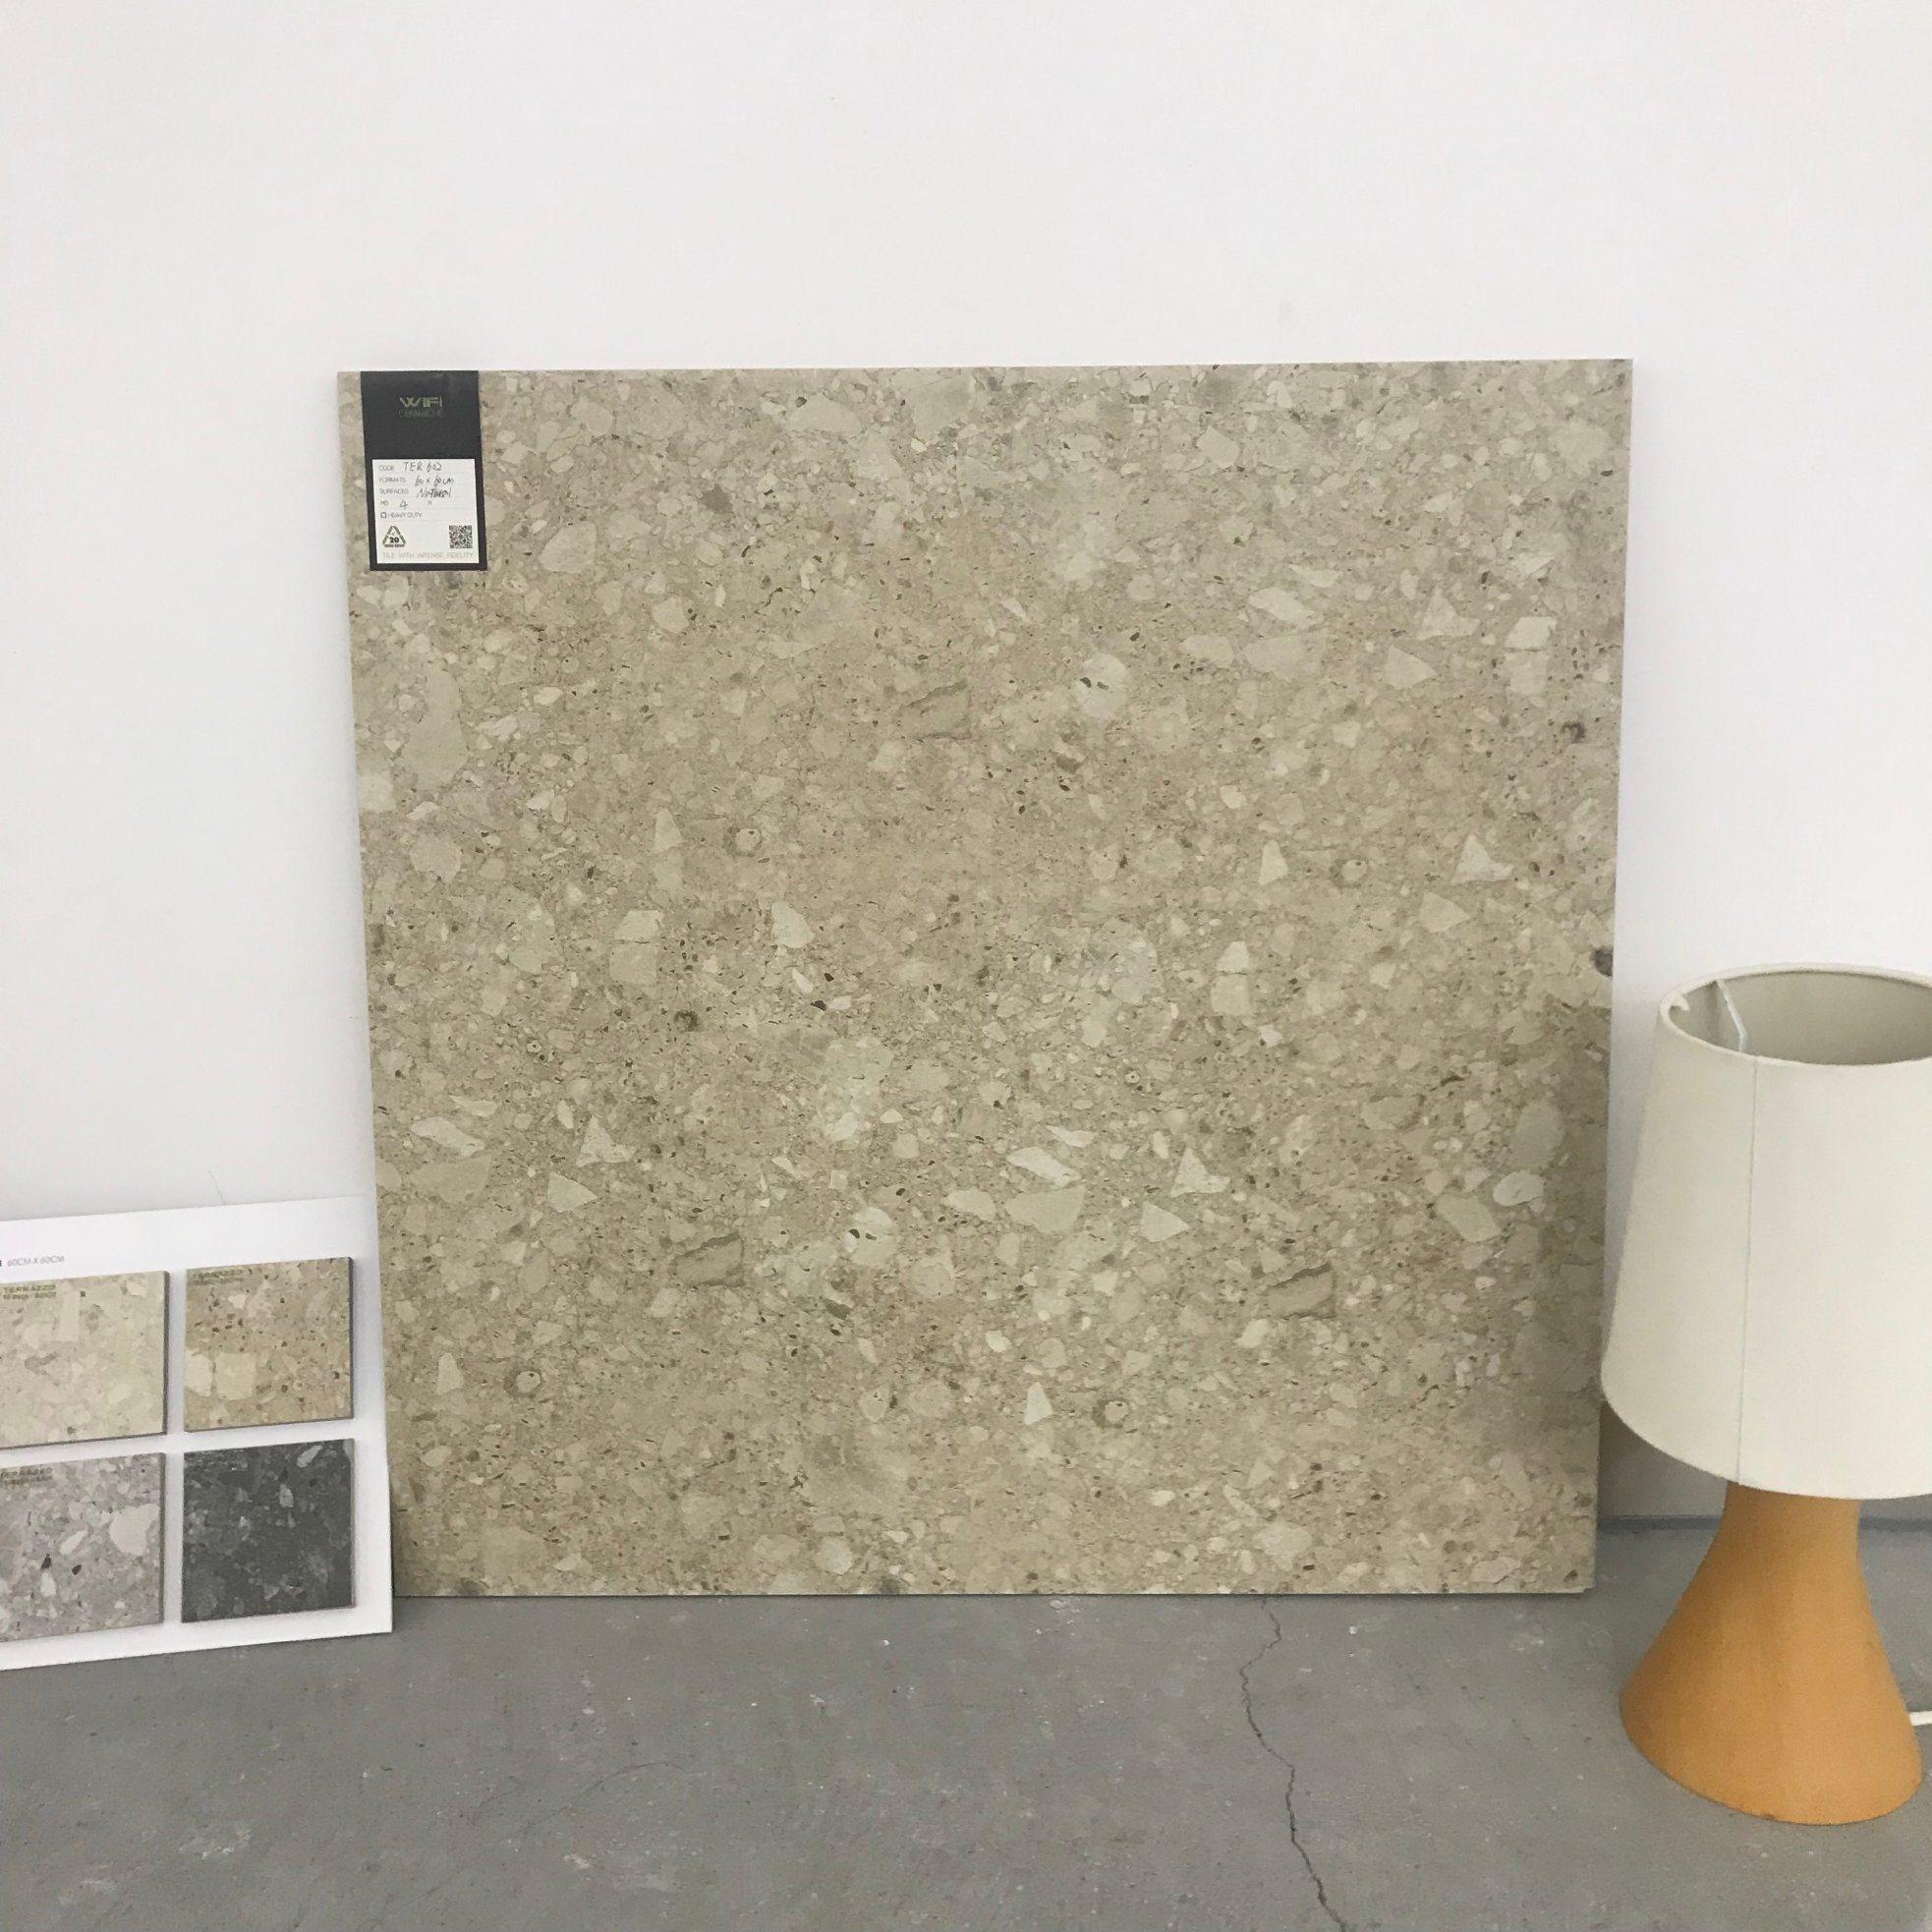 China Naturallappato Terrazzo Tile 600600mm Glazed Porcelain Floor